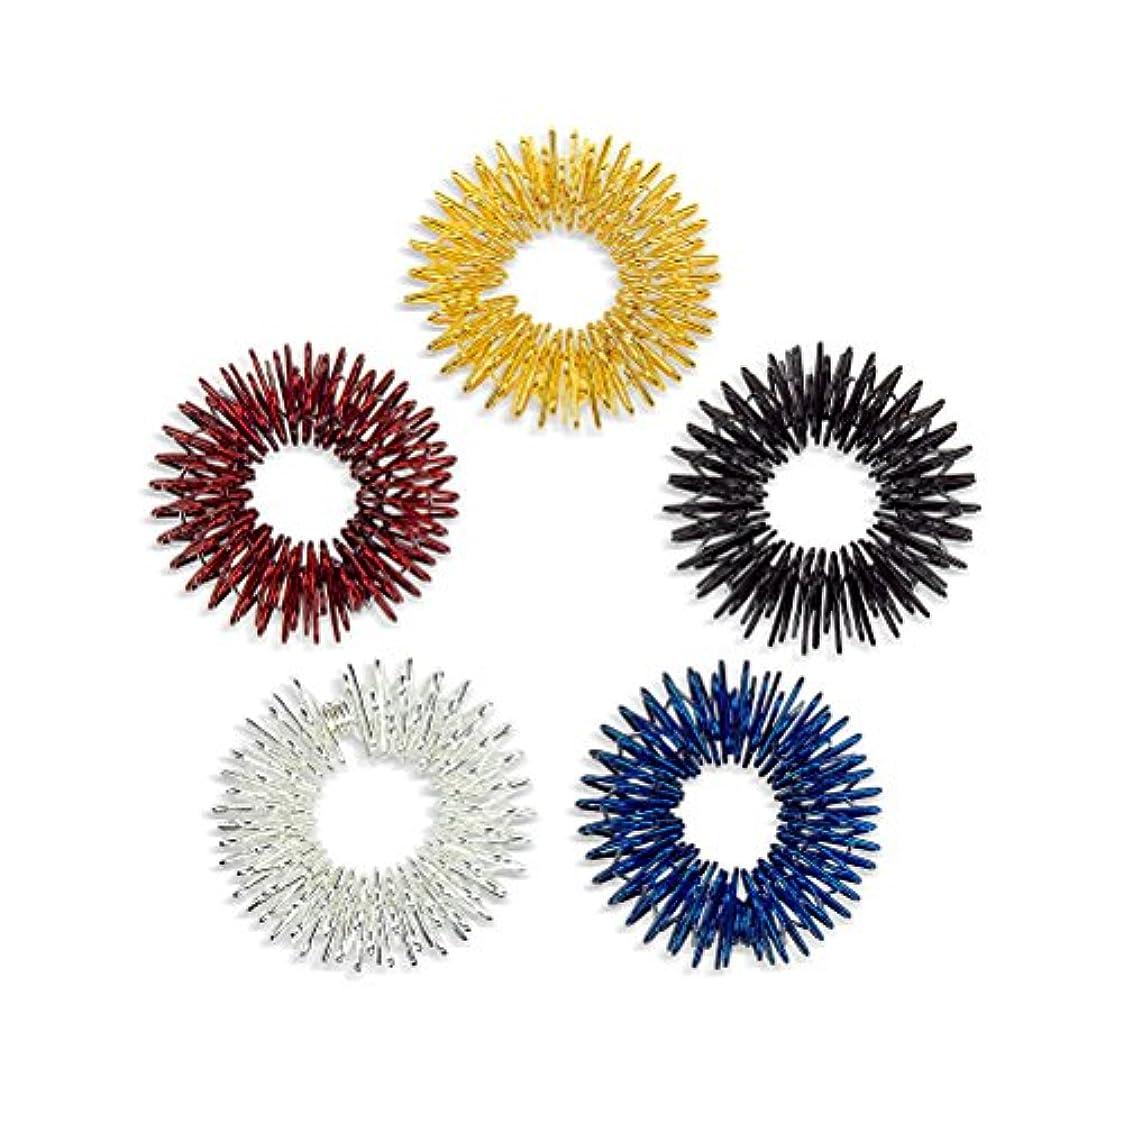 Healifty 10pcs指圧マッサージリング子供のための指の循環リング十代の若者たち大人(金/銀/黒/青/赤)